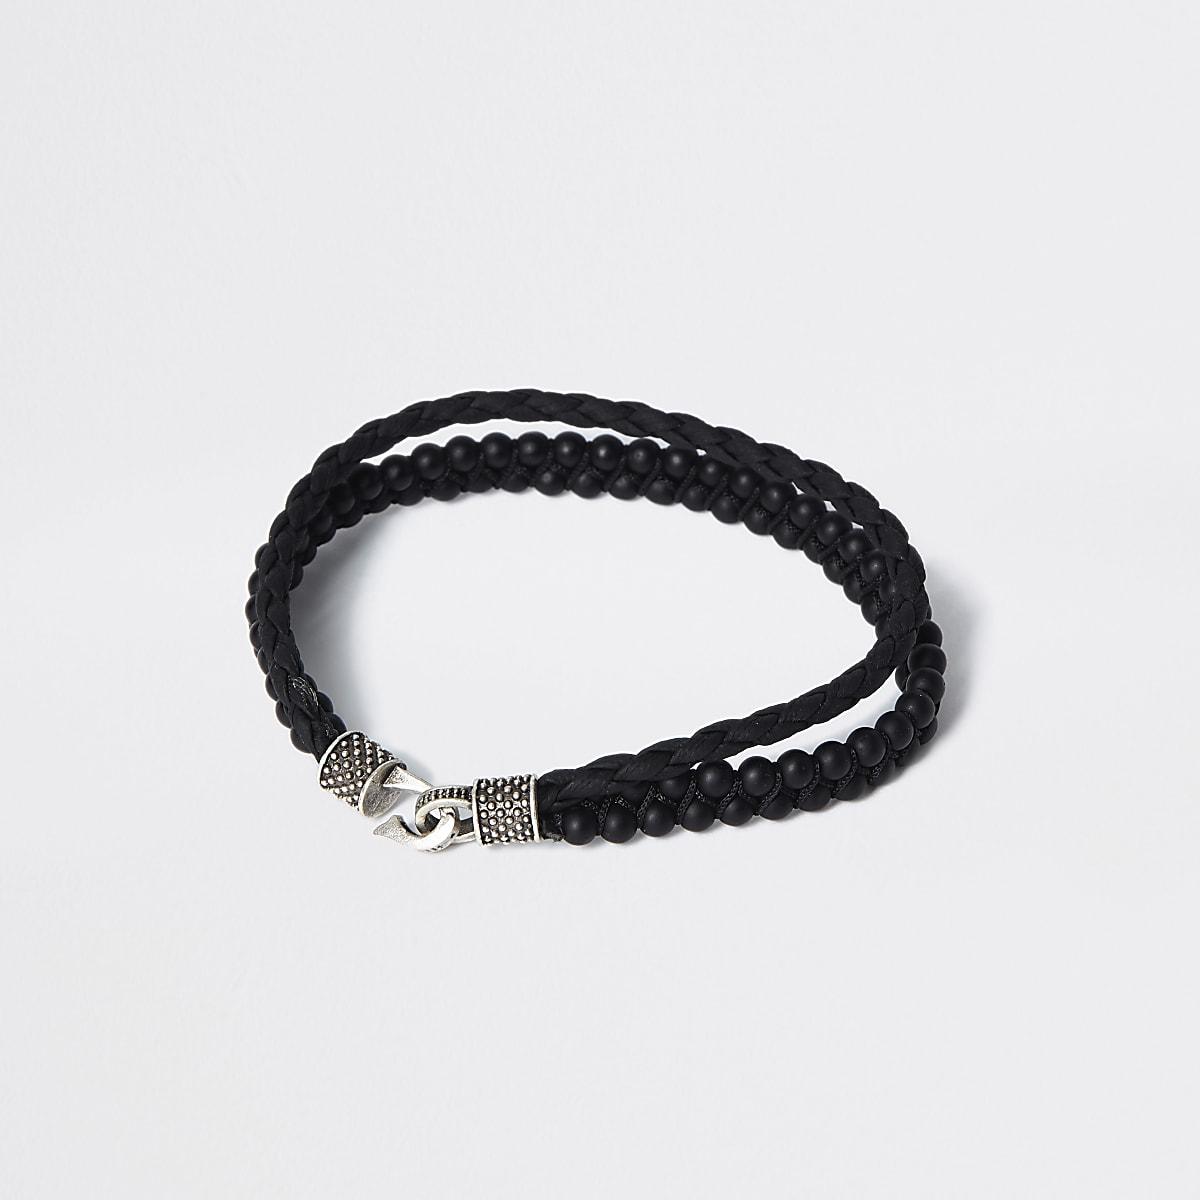 Black leather beaded layered bracelet